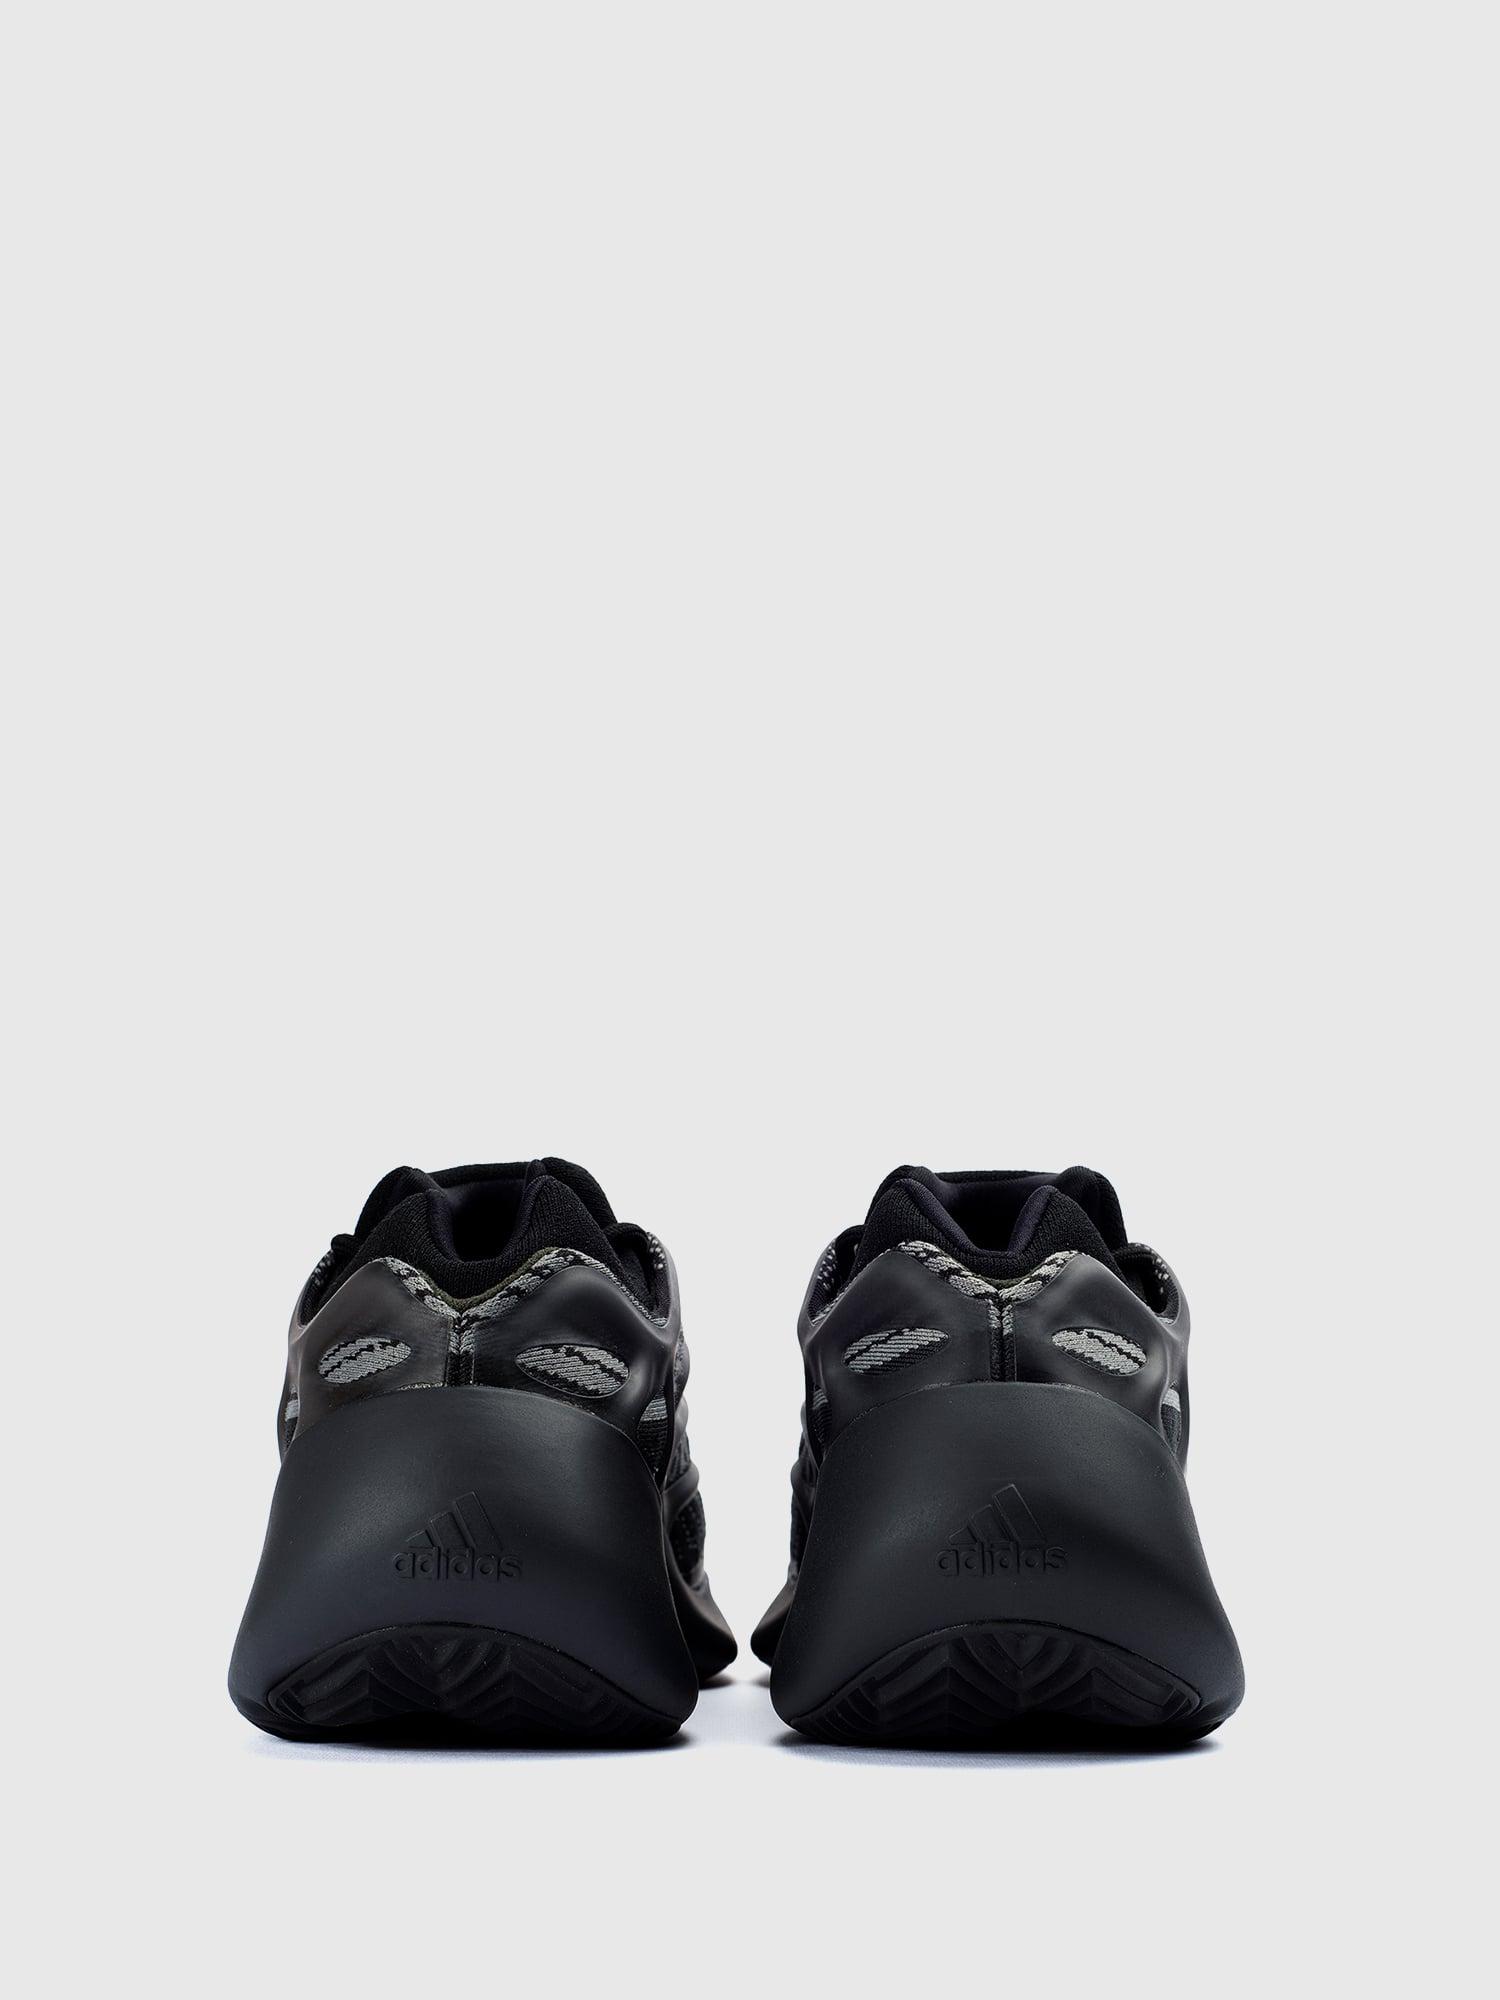 Adidas YEEZY 700 V3 ALVAH Black